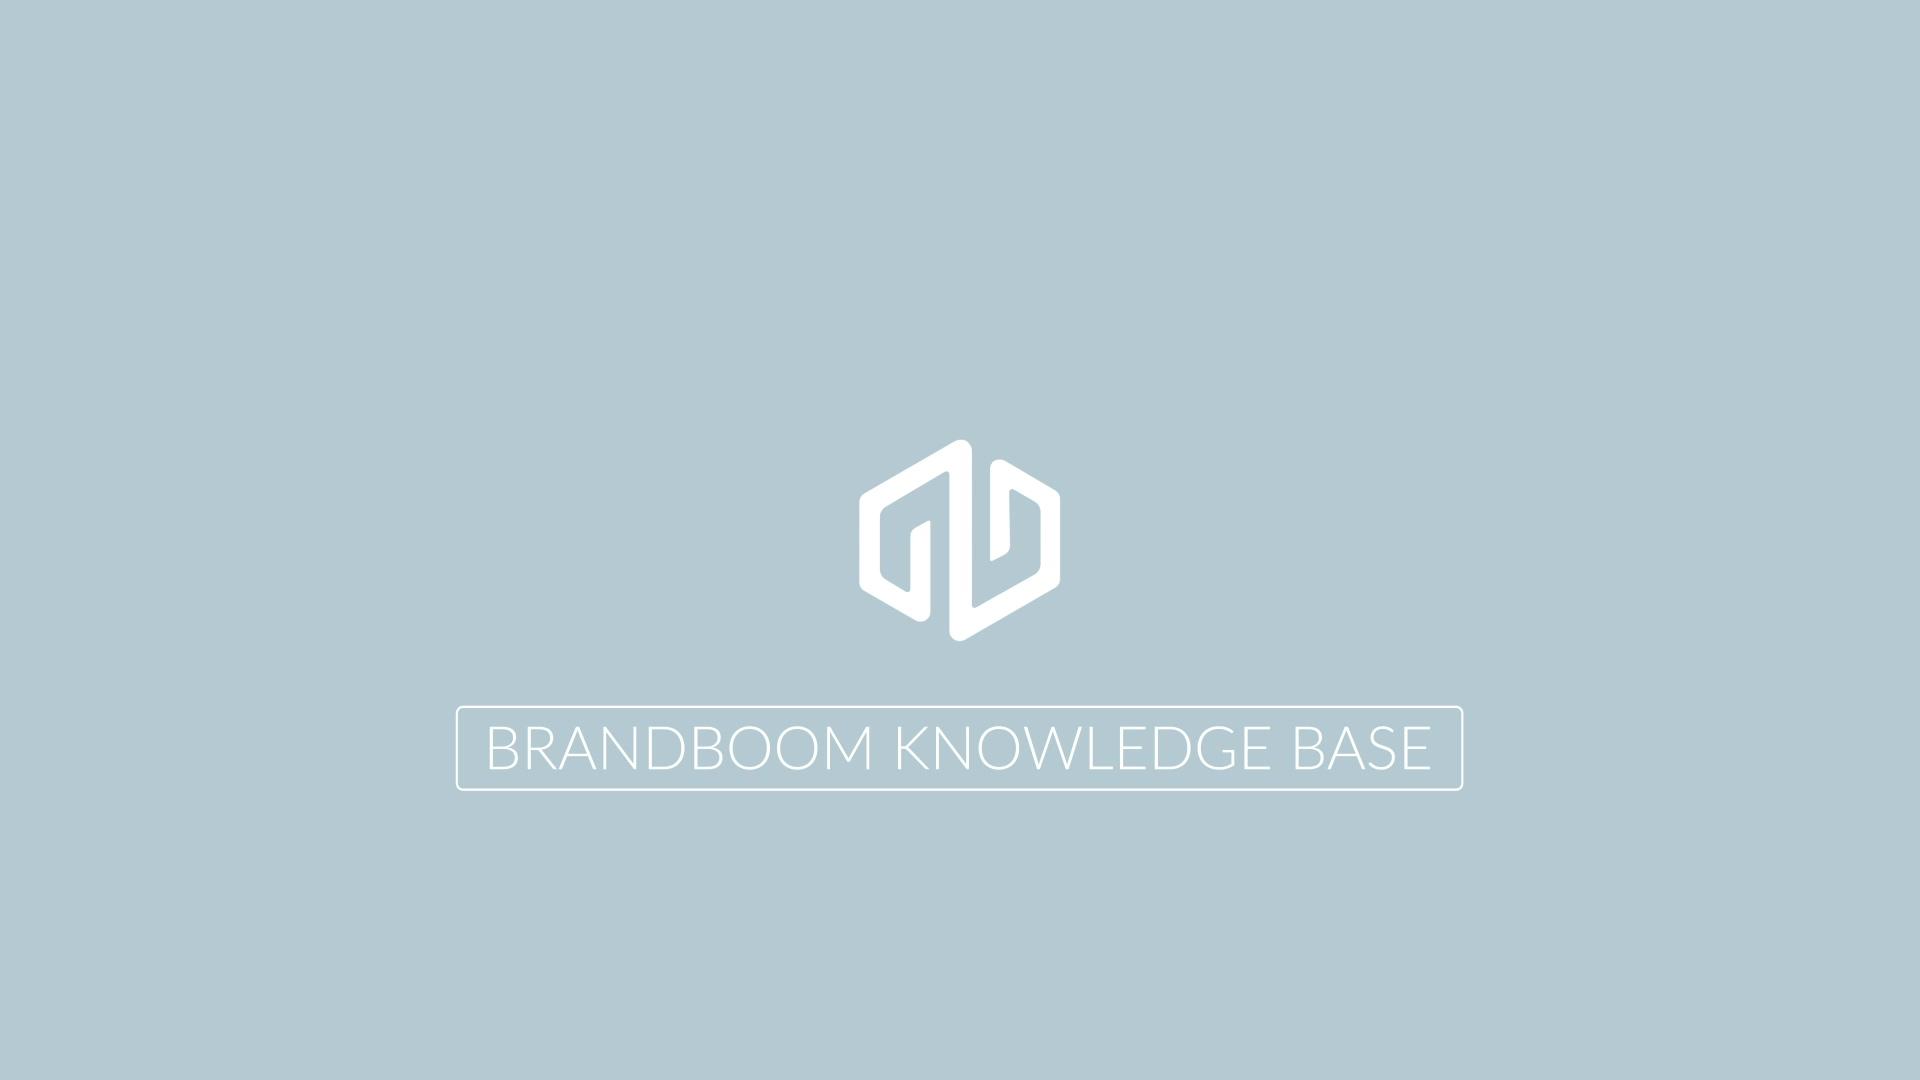 Brandboom - Knowledge Base - Introduction Comp FINAL 1